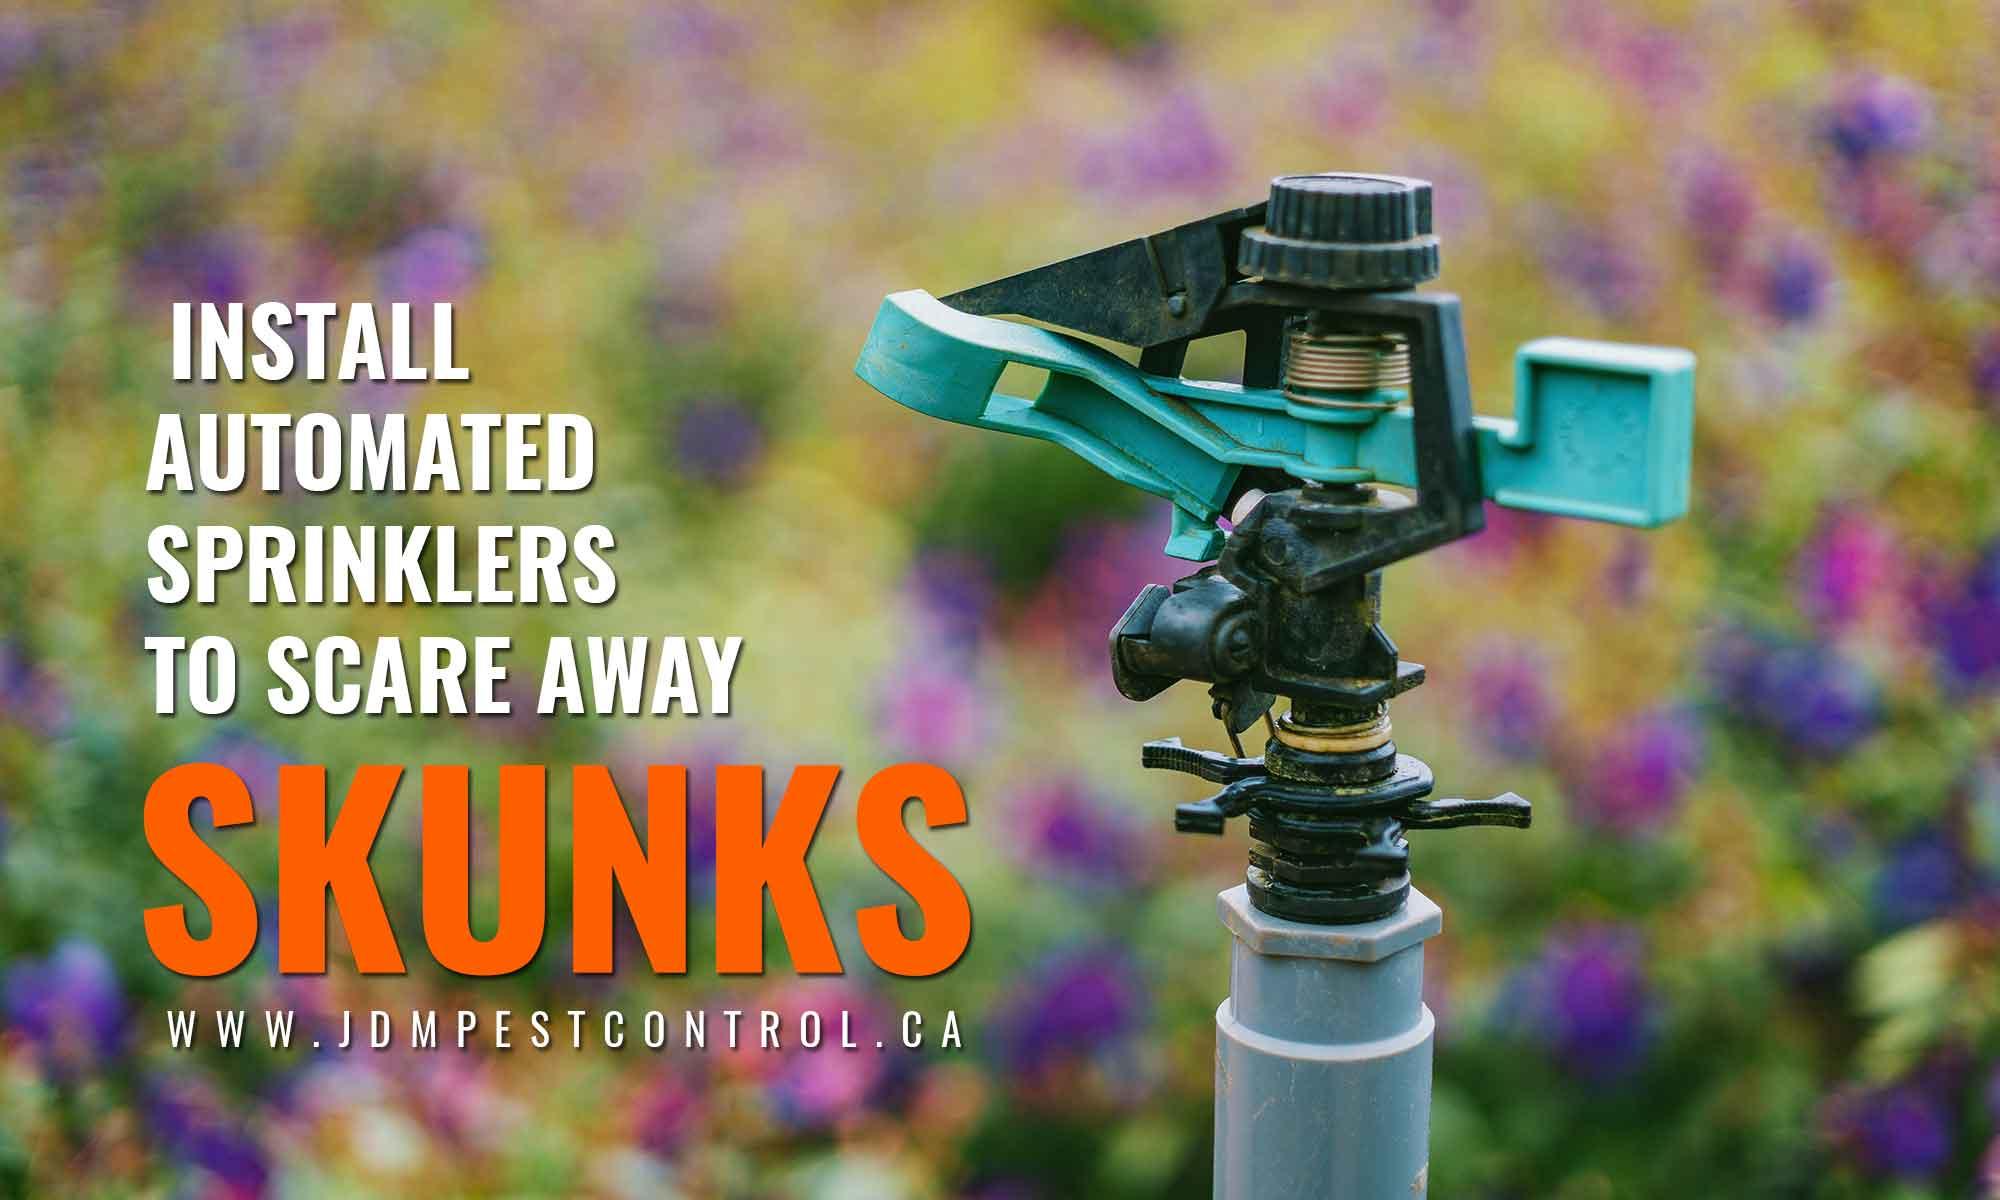 install automated sprinklers